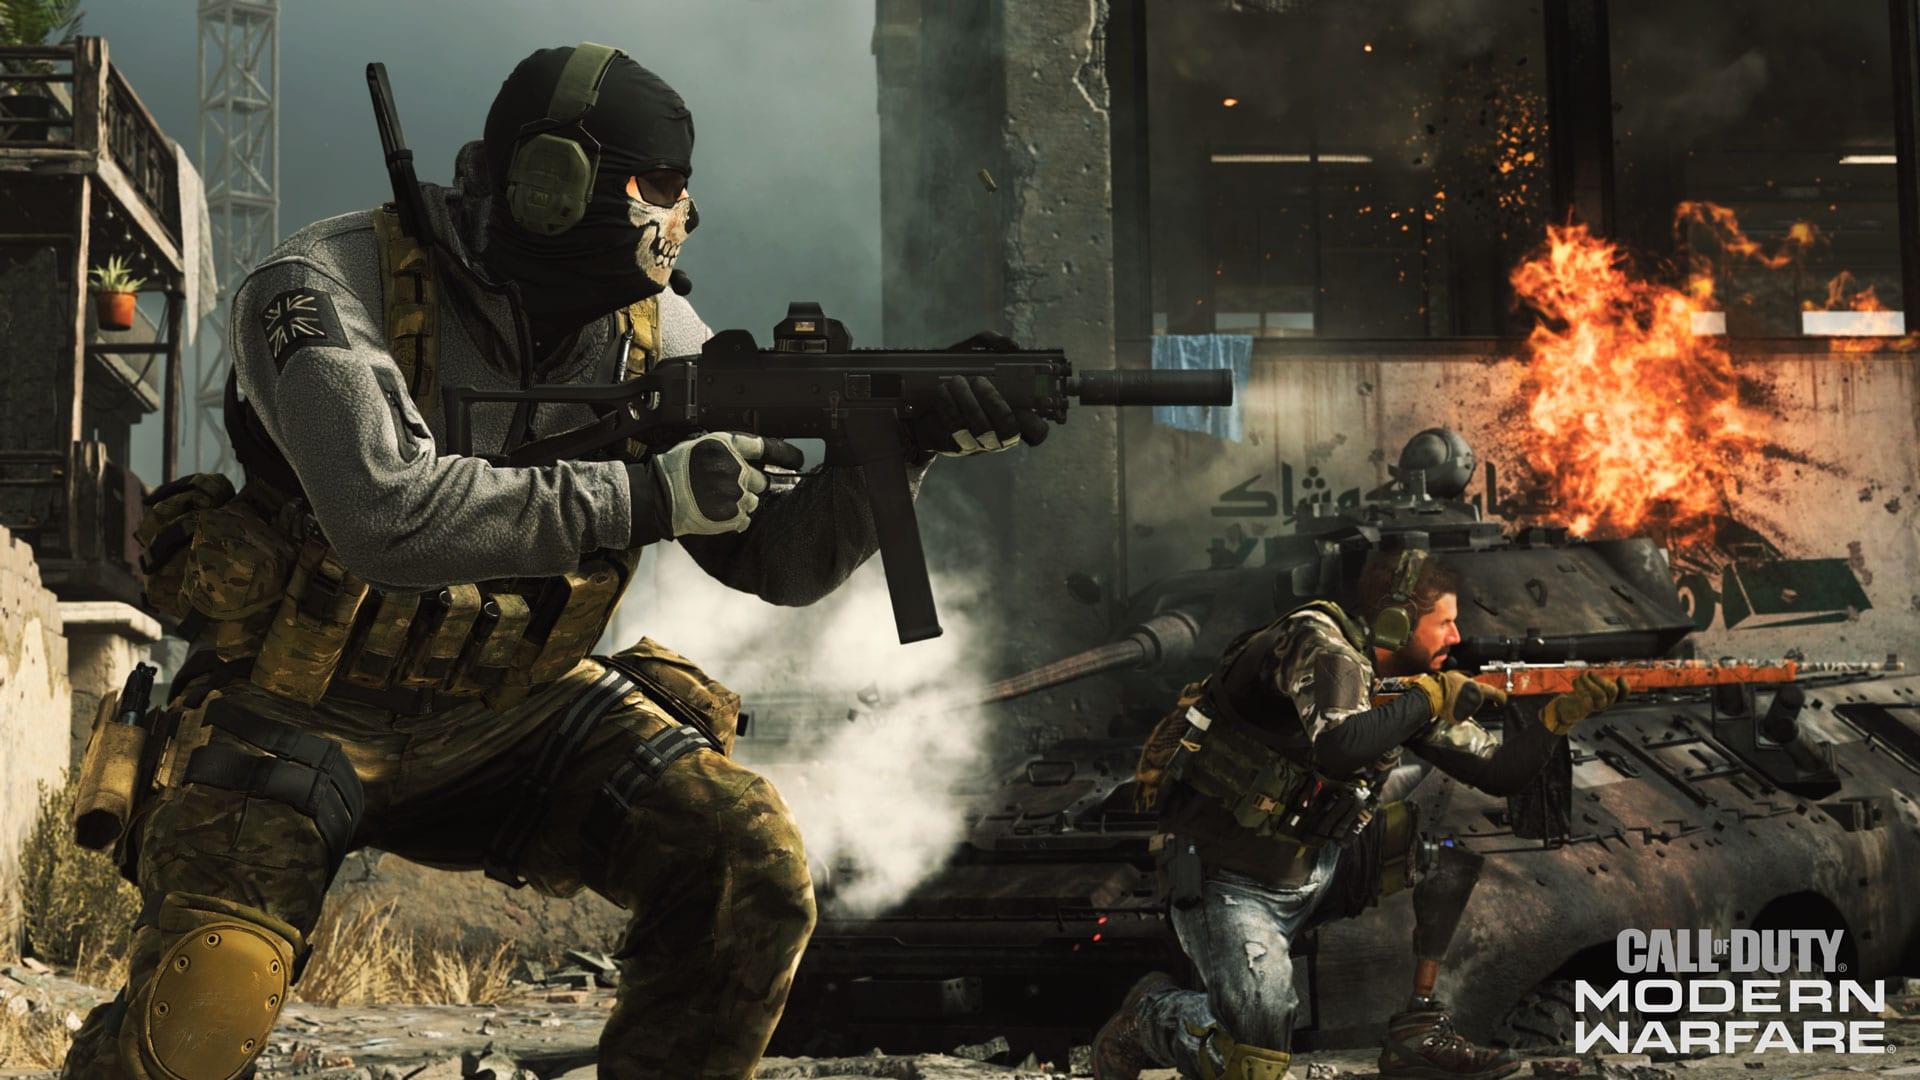 Call of Duty Modern Warfare Free Weekend